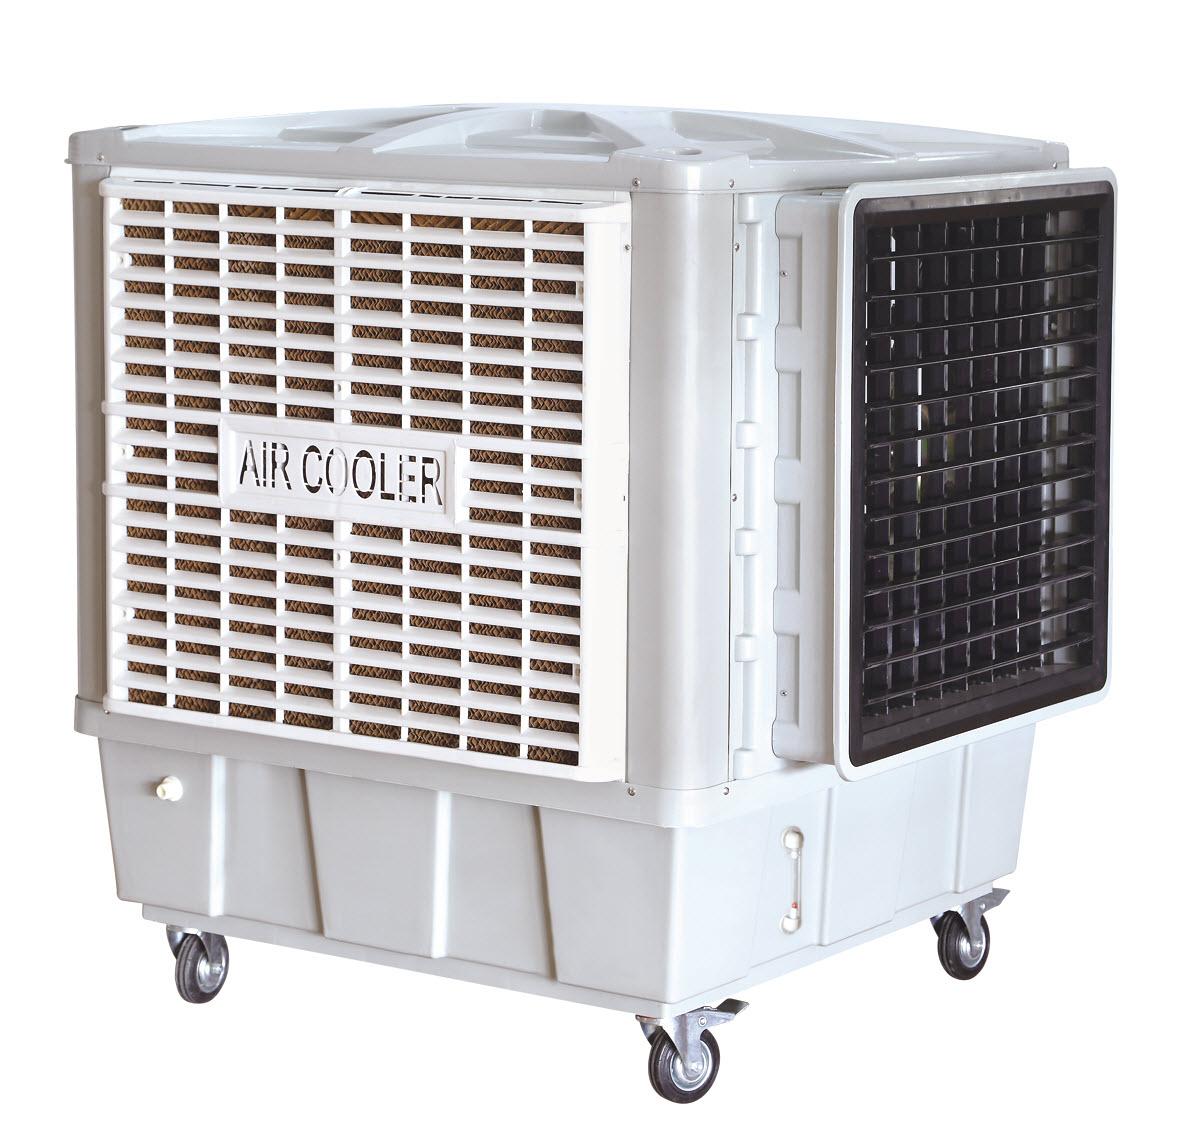 CY environmental air condiioner